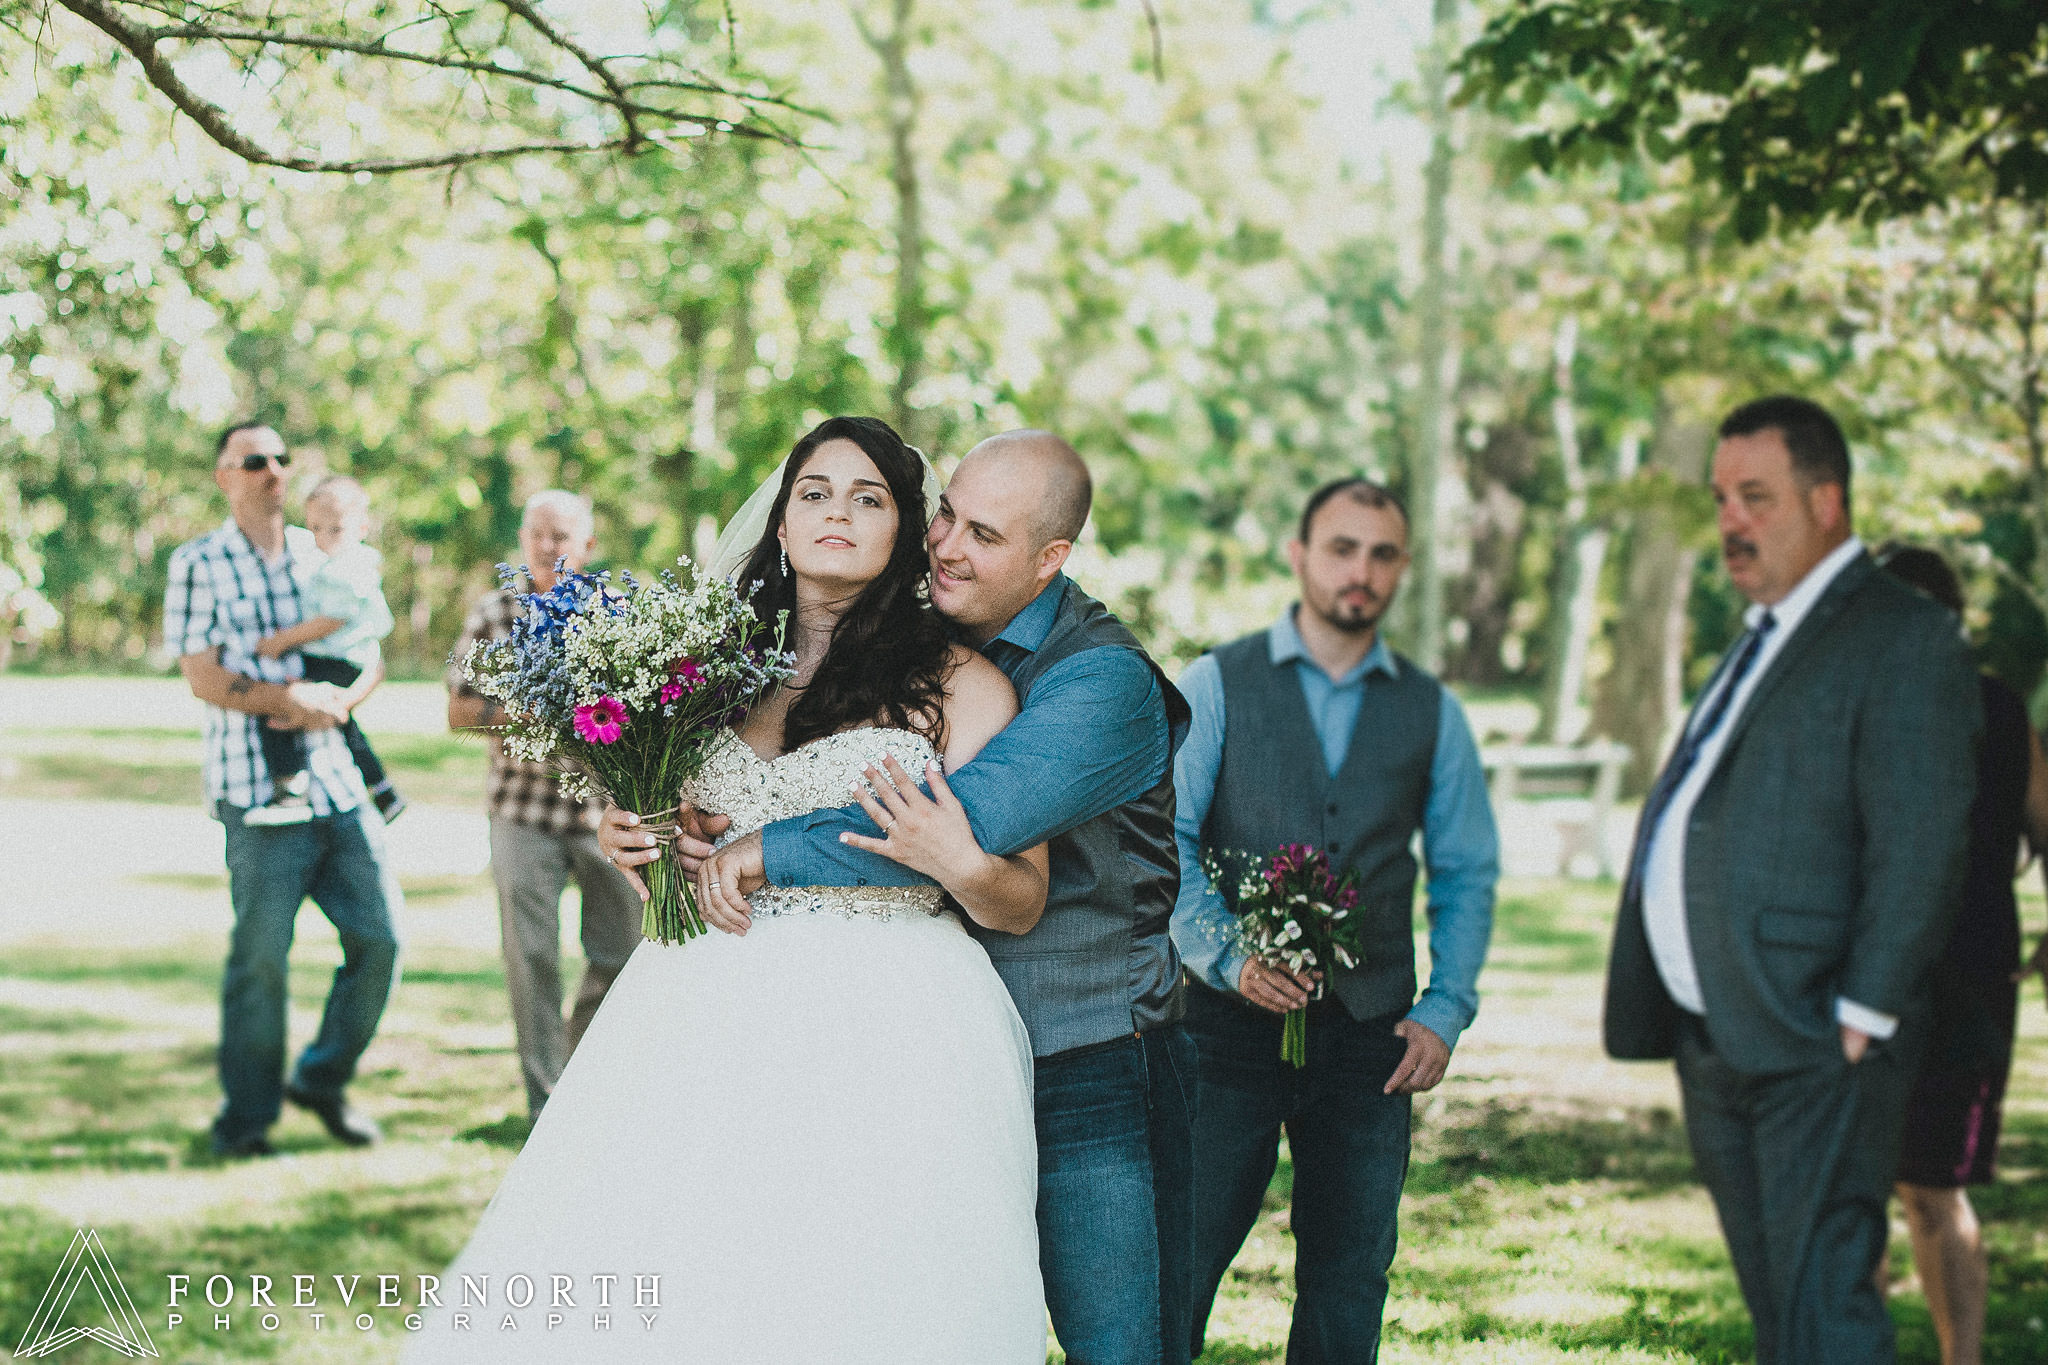 Brown-Allaire-State-Park-Wedding-Photographer-24.JPG